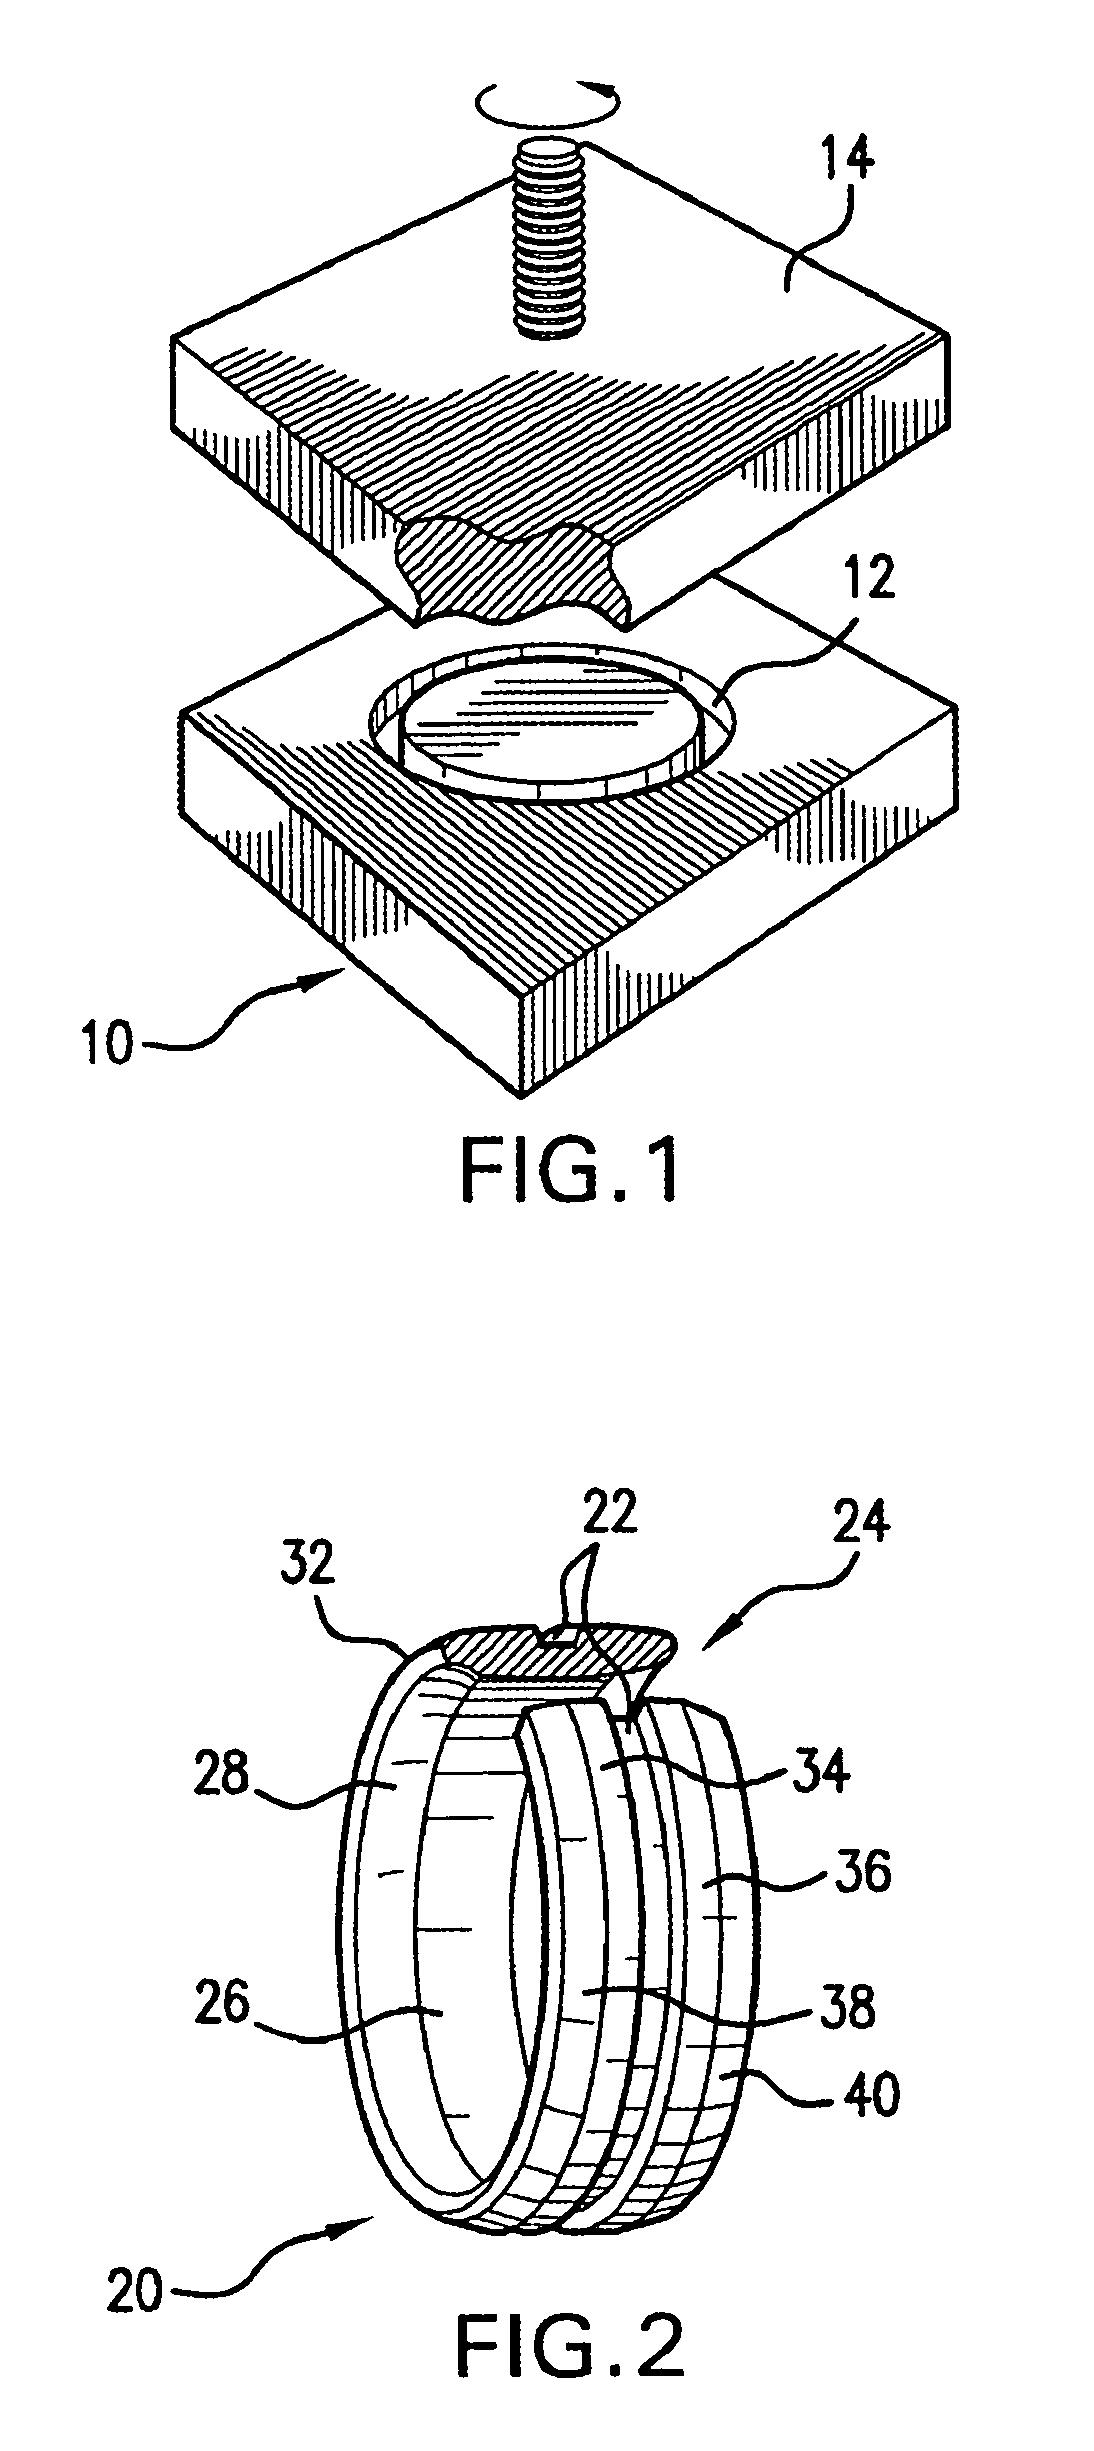 Iridium Wedding Band 65 Trend Patent Drawing